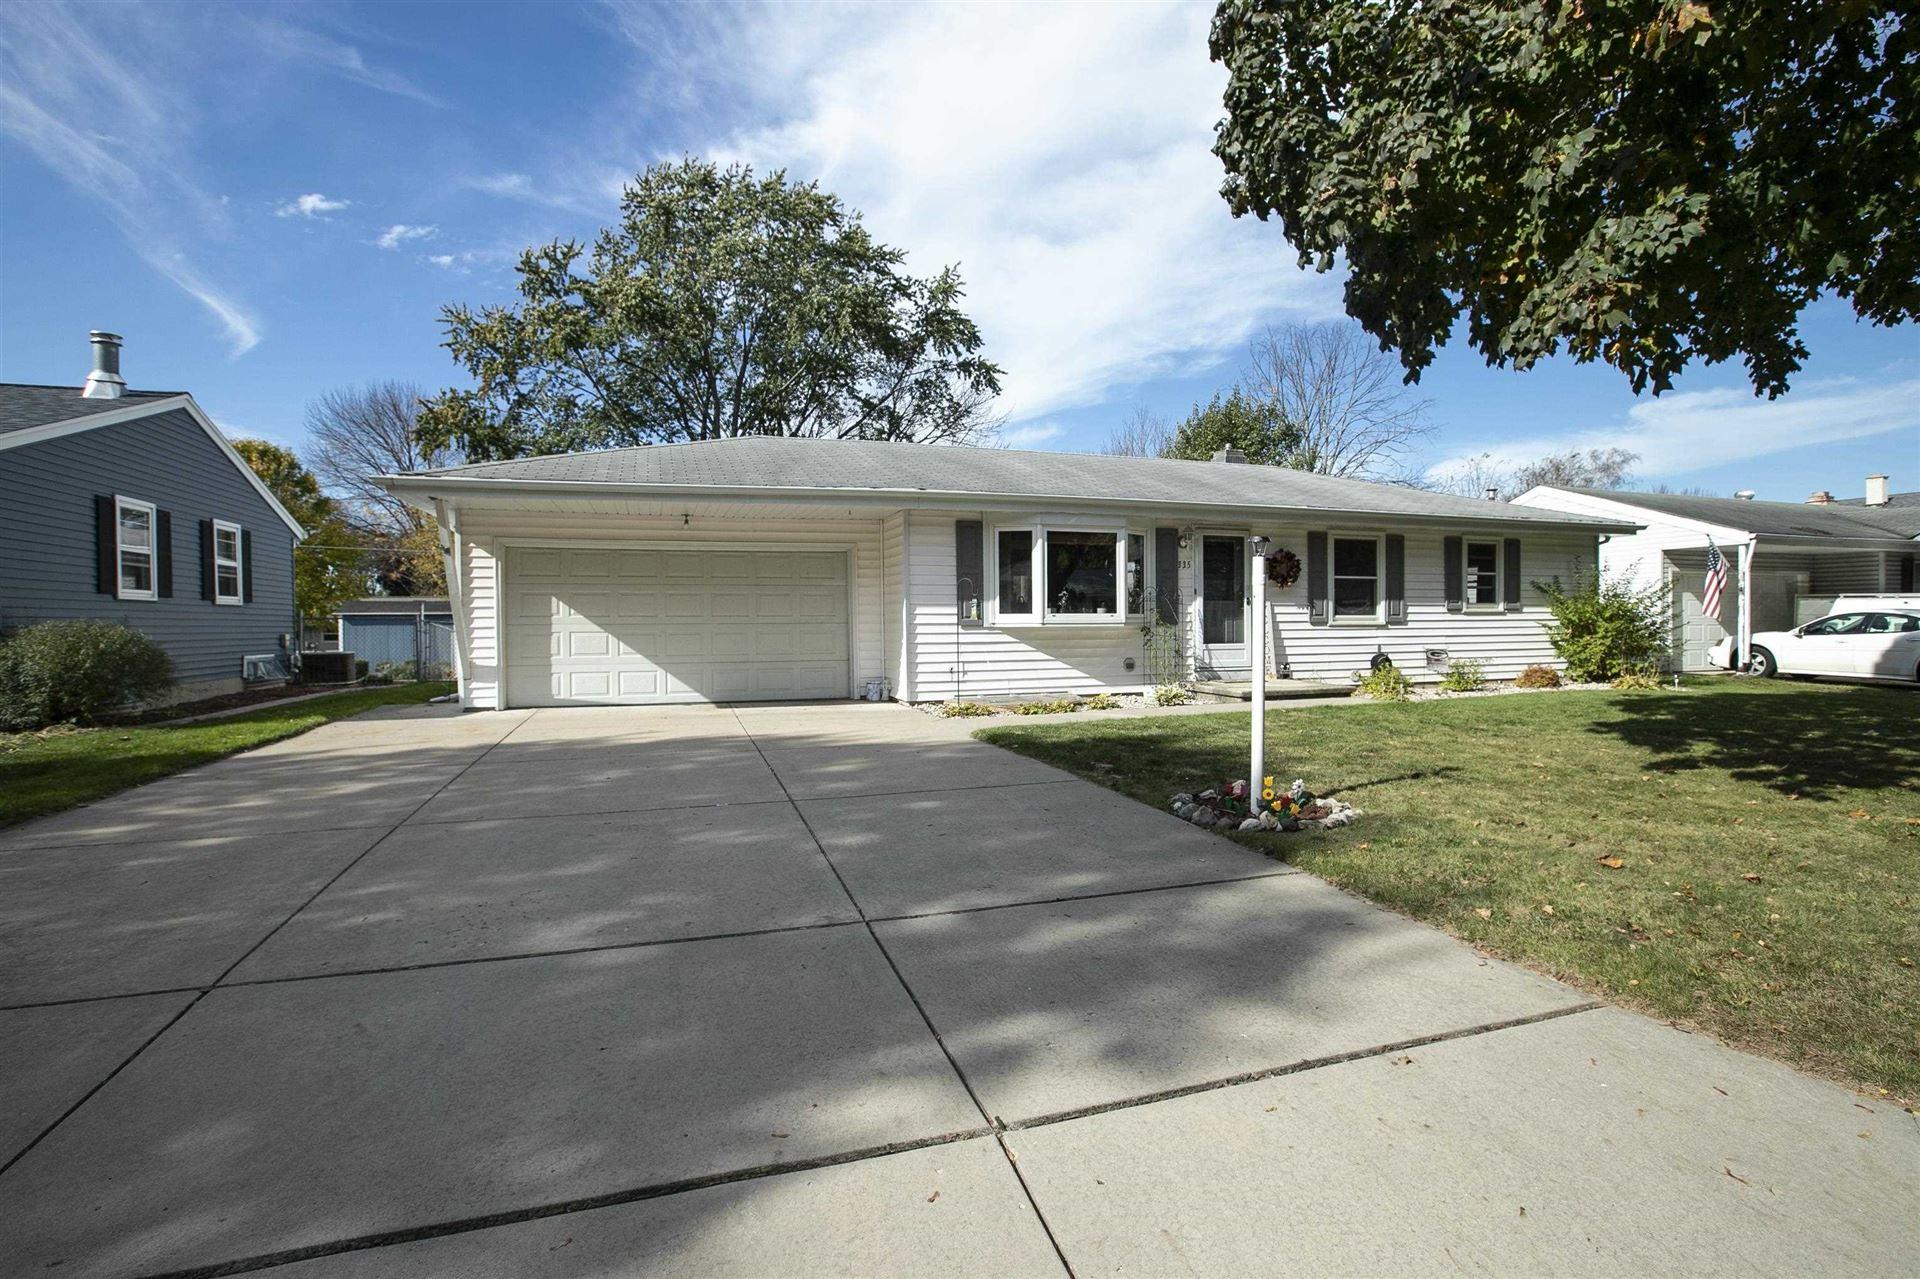 335 CONOVER Drive, Green Bay, WI 54303 - MLS#: 50249952